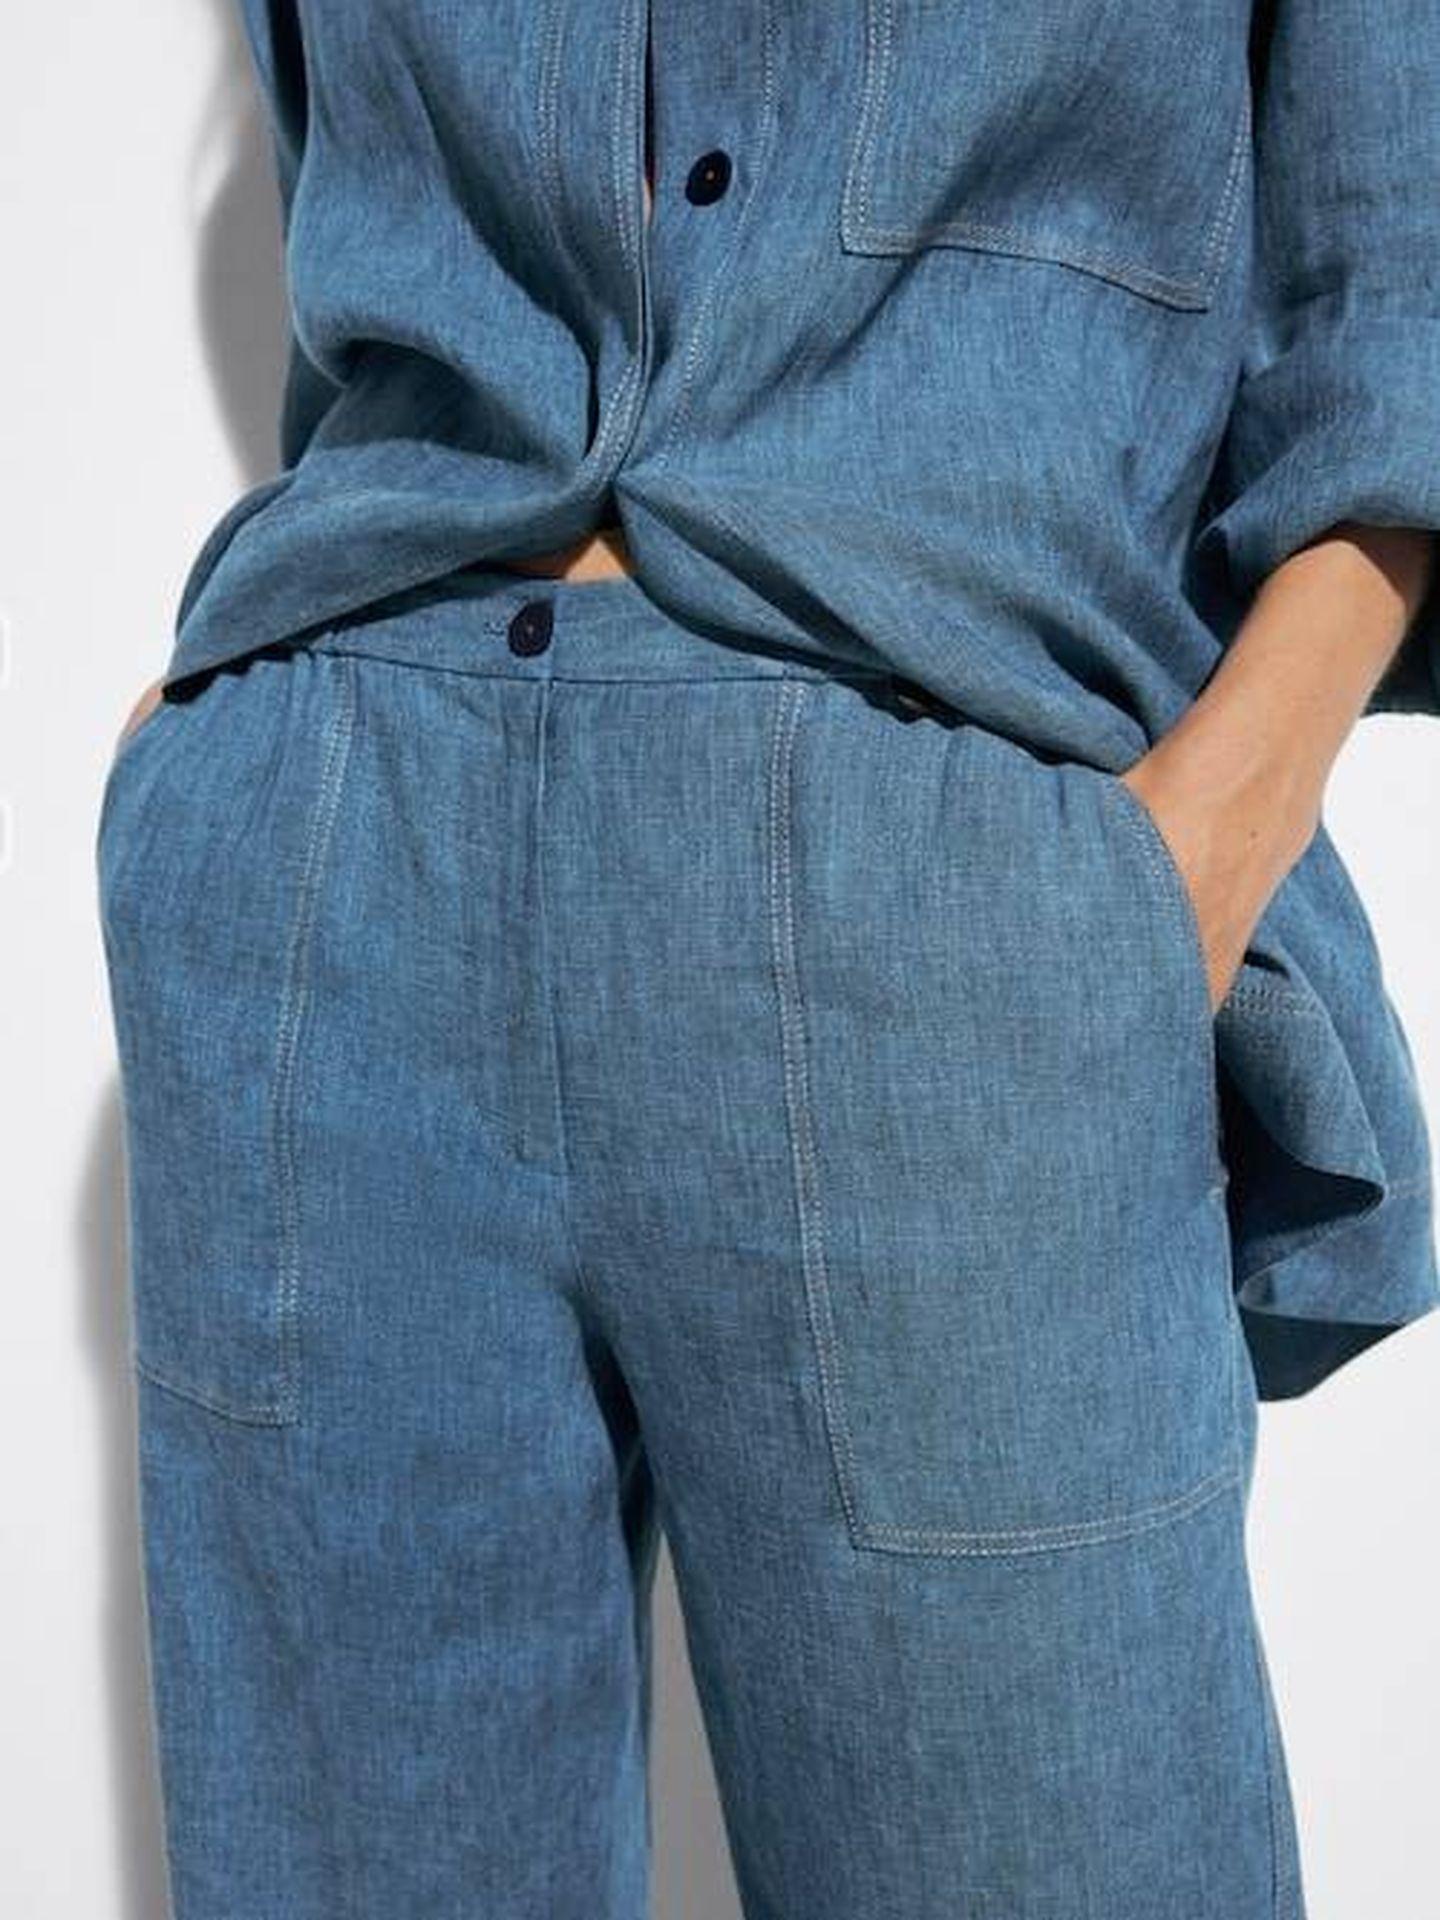 El pantalón vaquero de Massimo Dutti. (Cortesía)